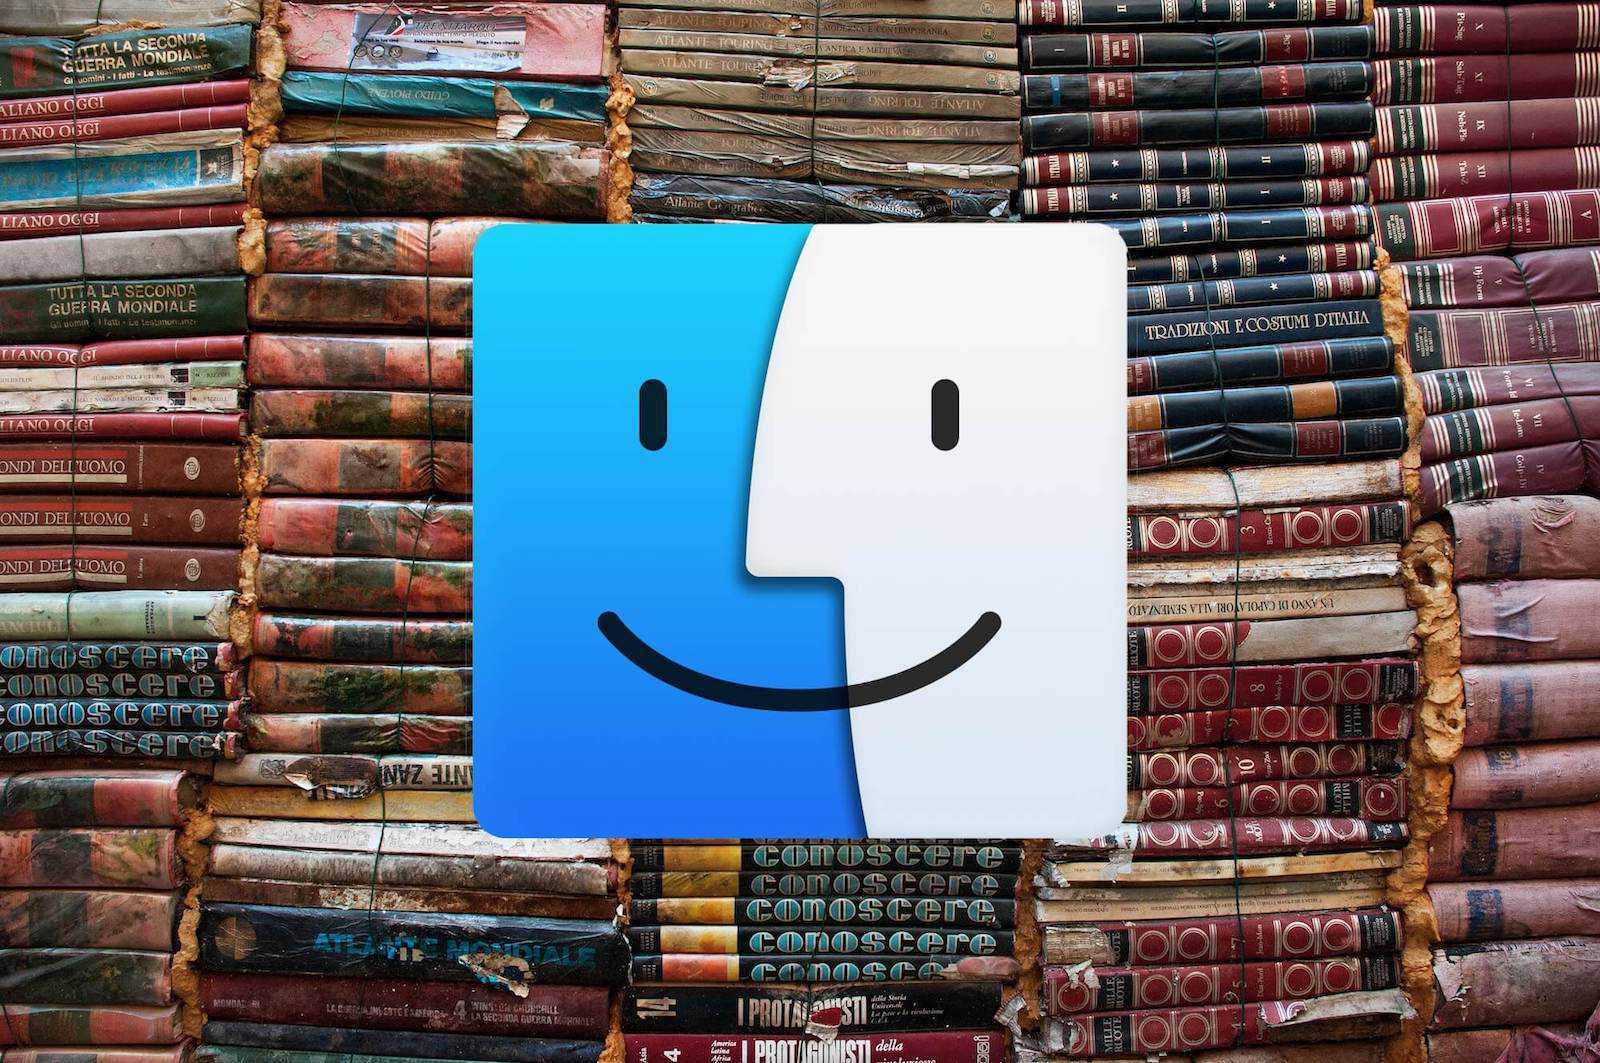 Macのライブラリフォルダへ簡単に移動する方法-アイキャッチ